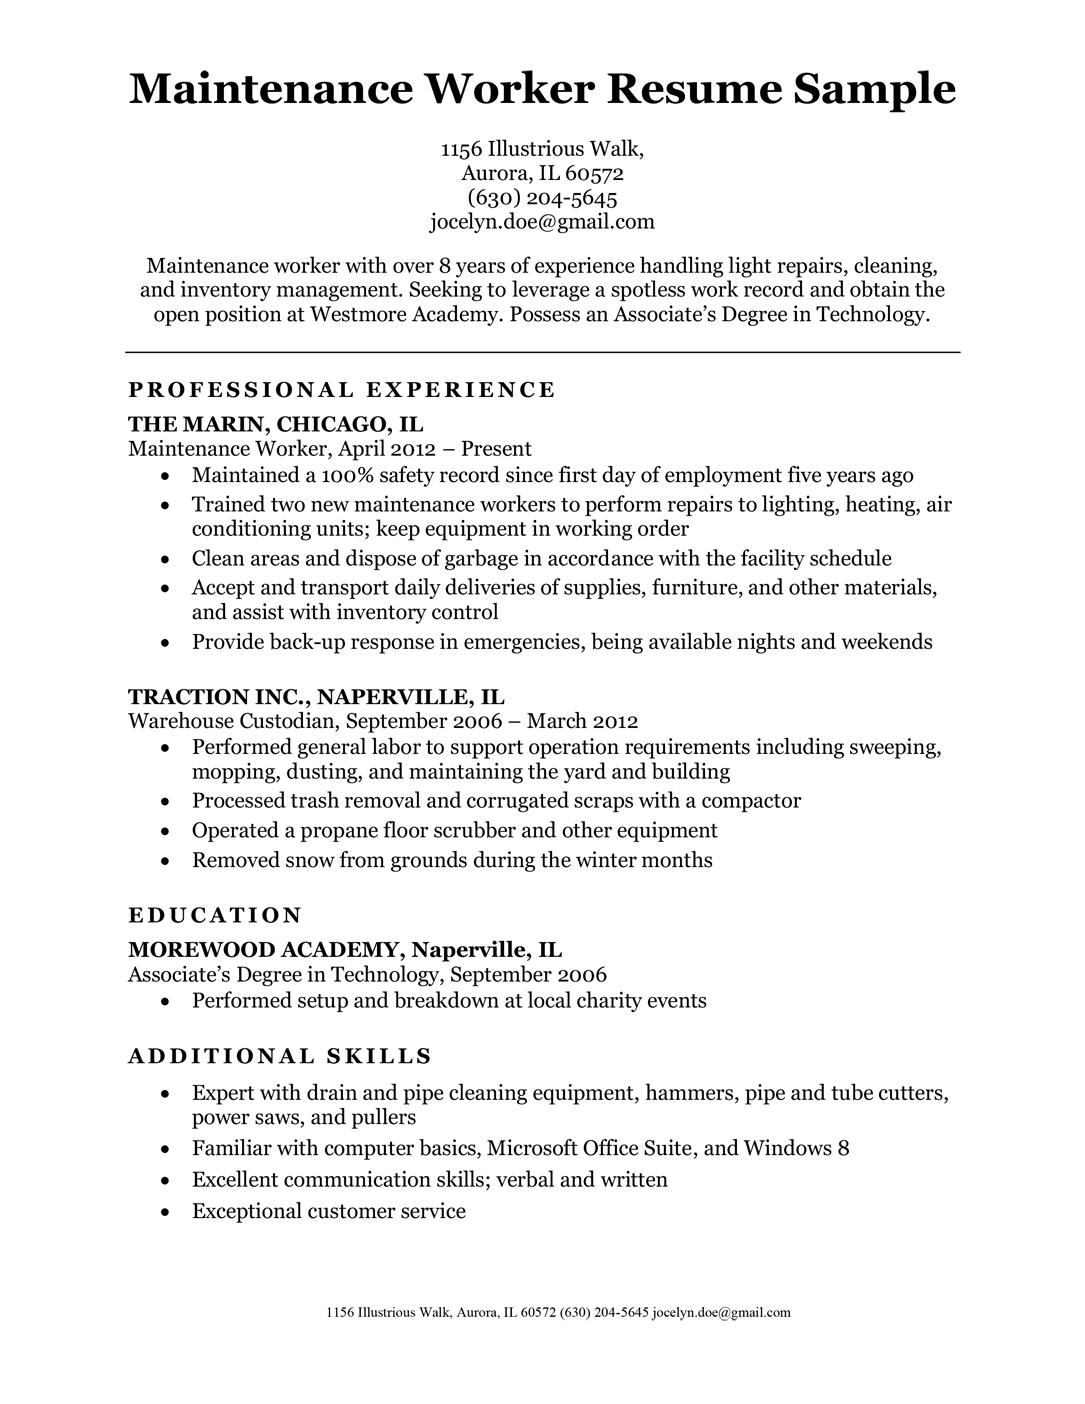 Maintenance worker resume sample